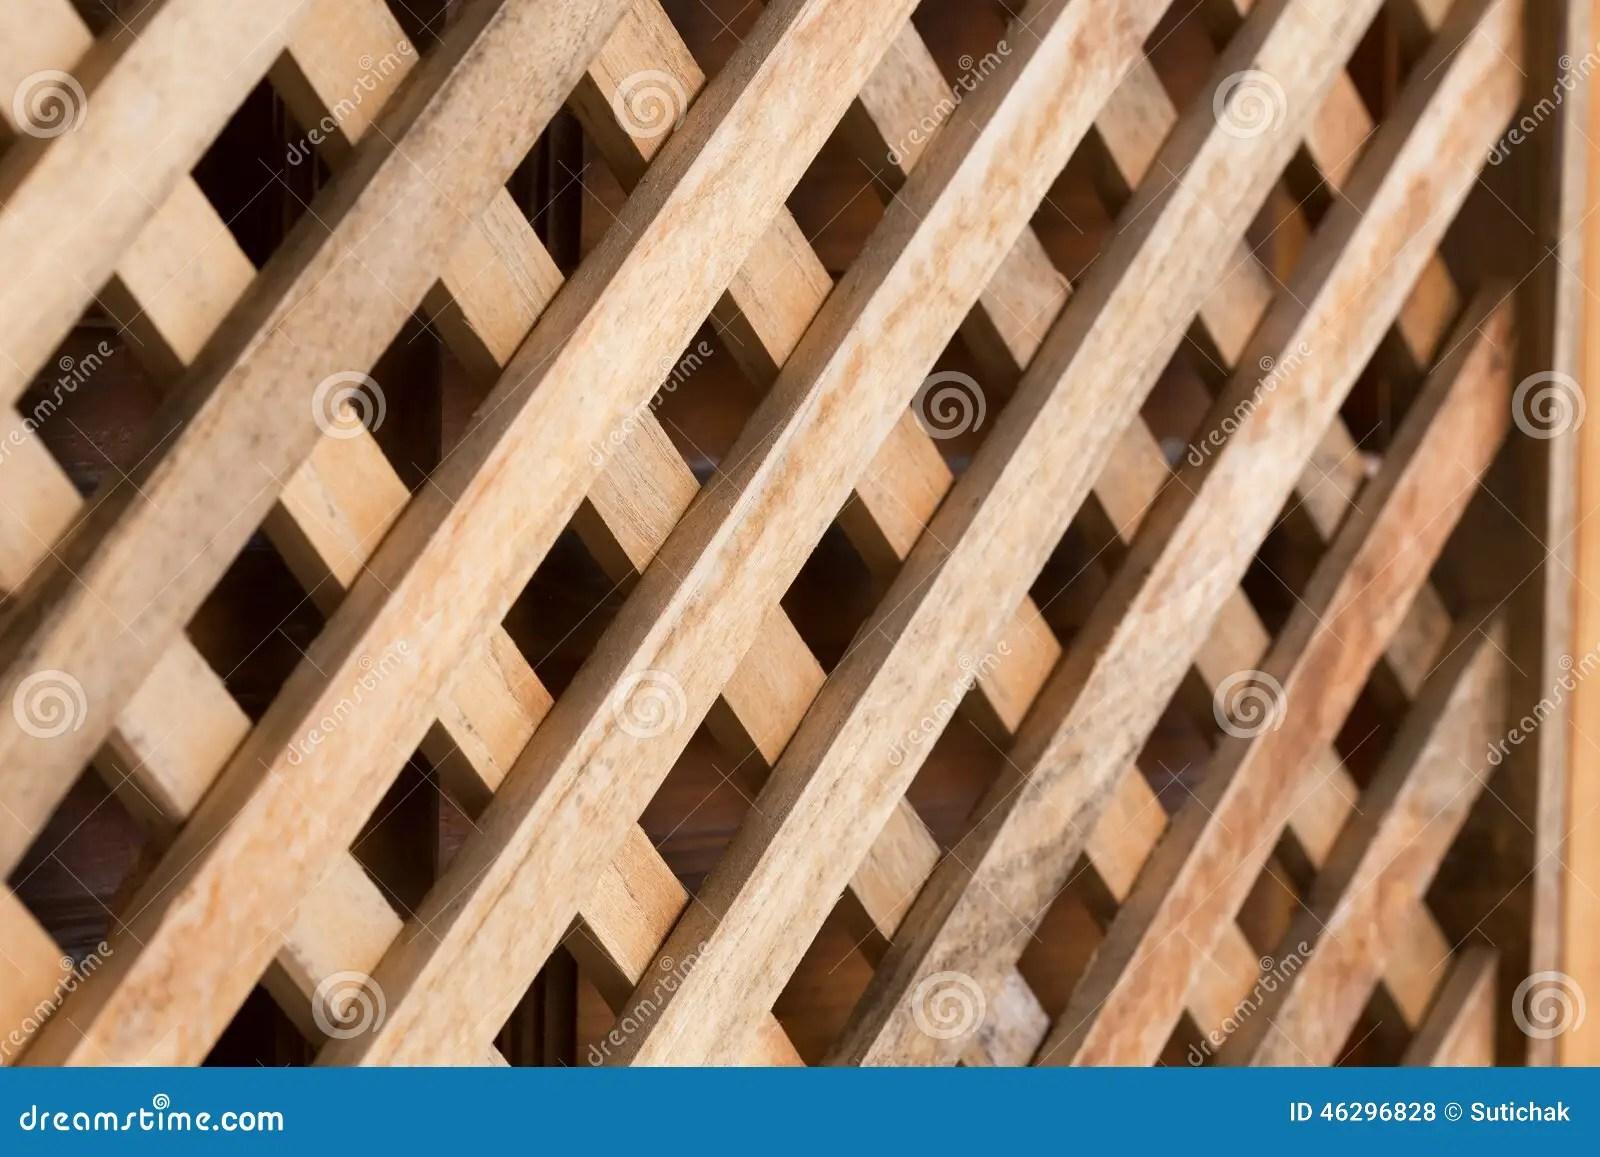 Design Of Wood Wall Panel Plank Cross Stock Photo Image